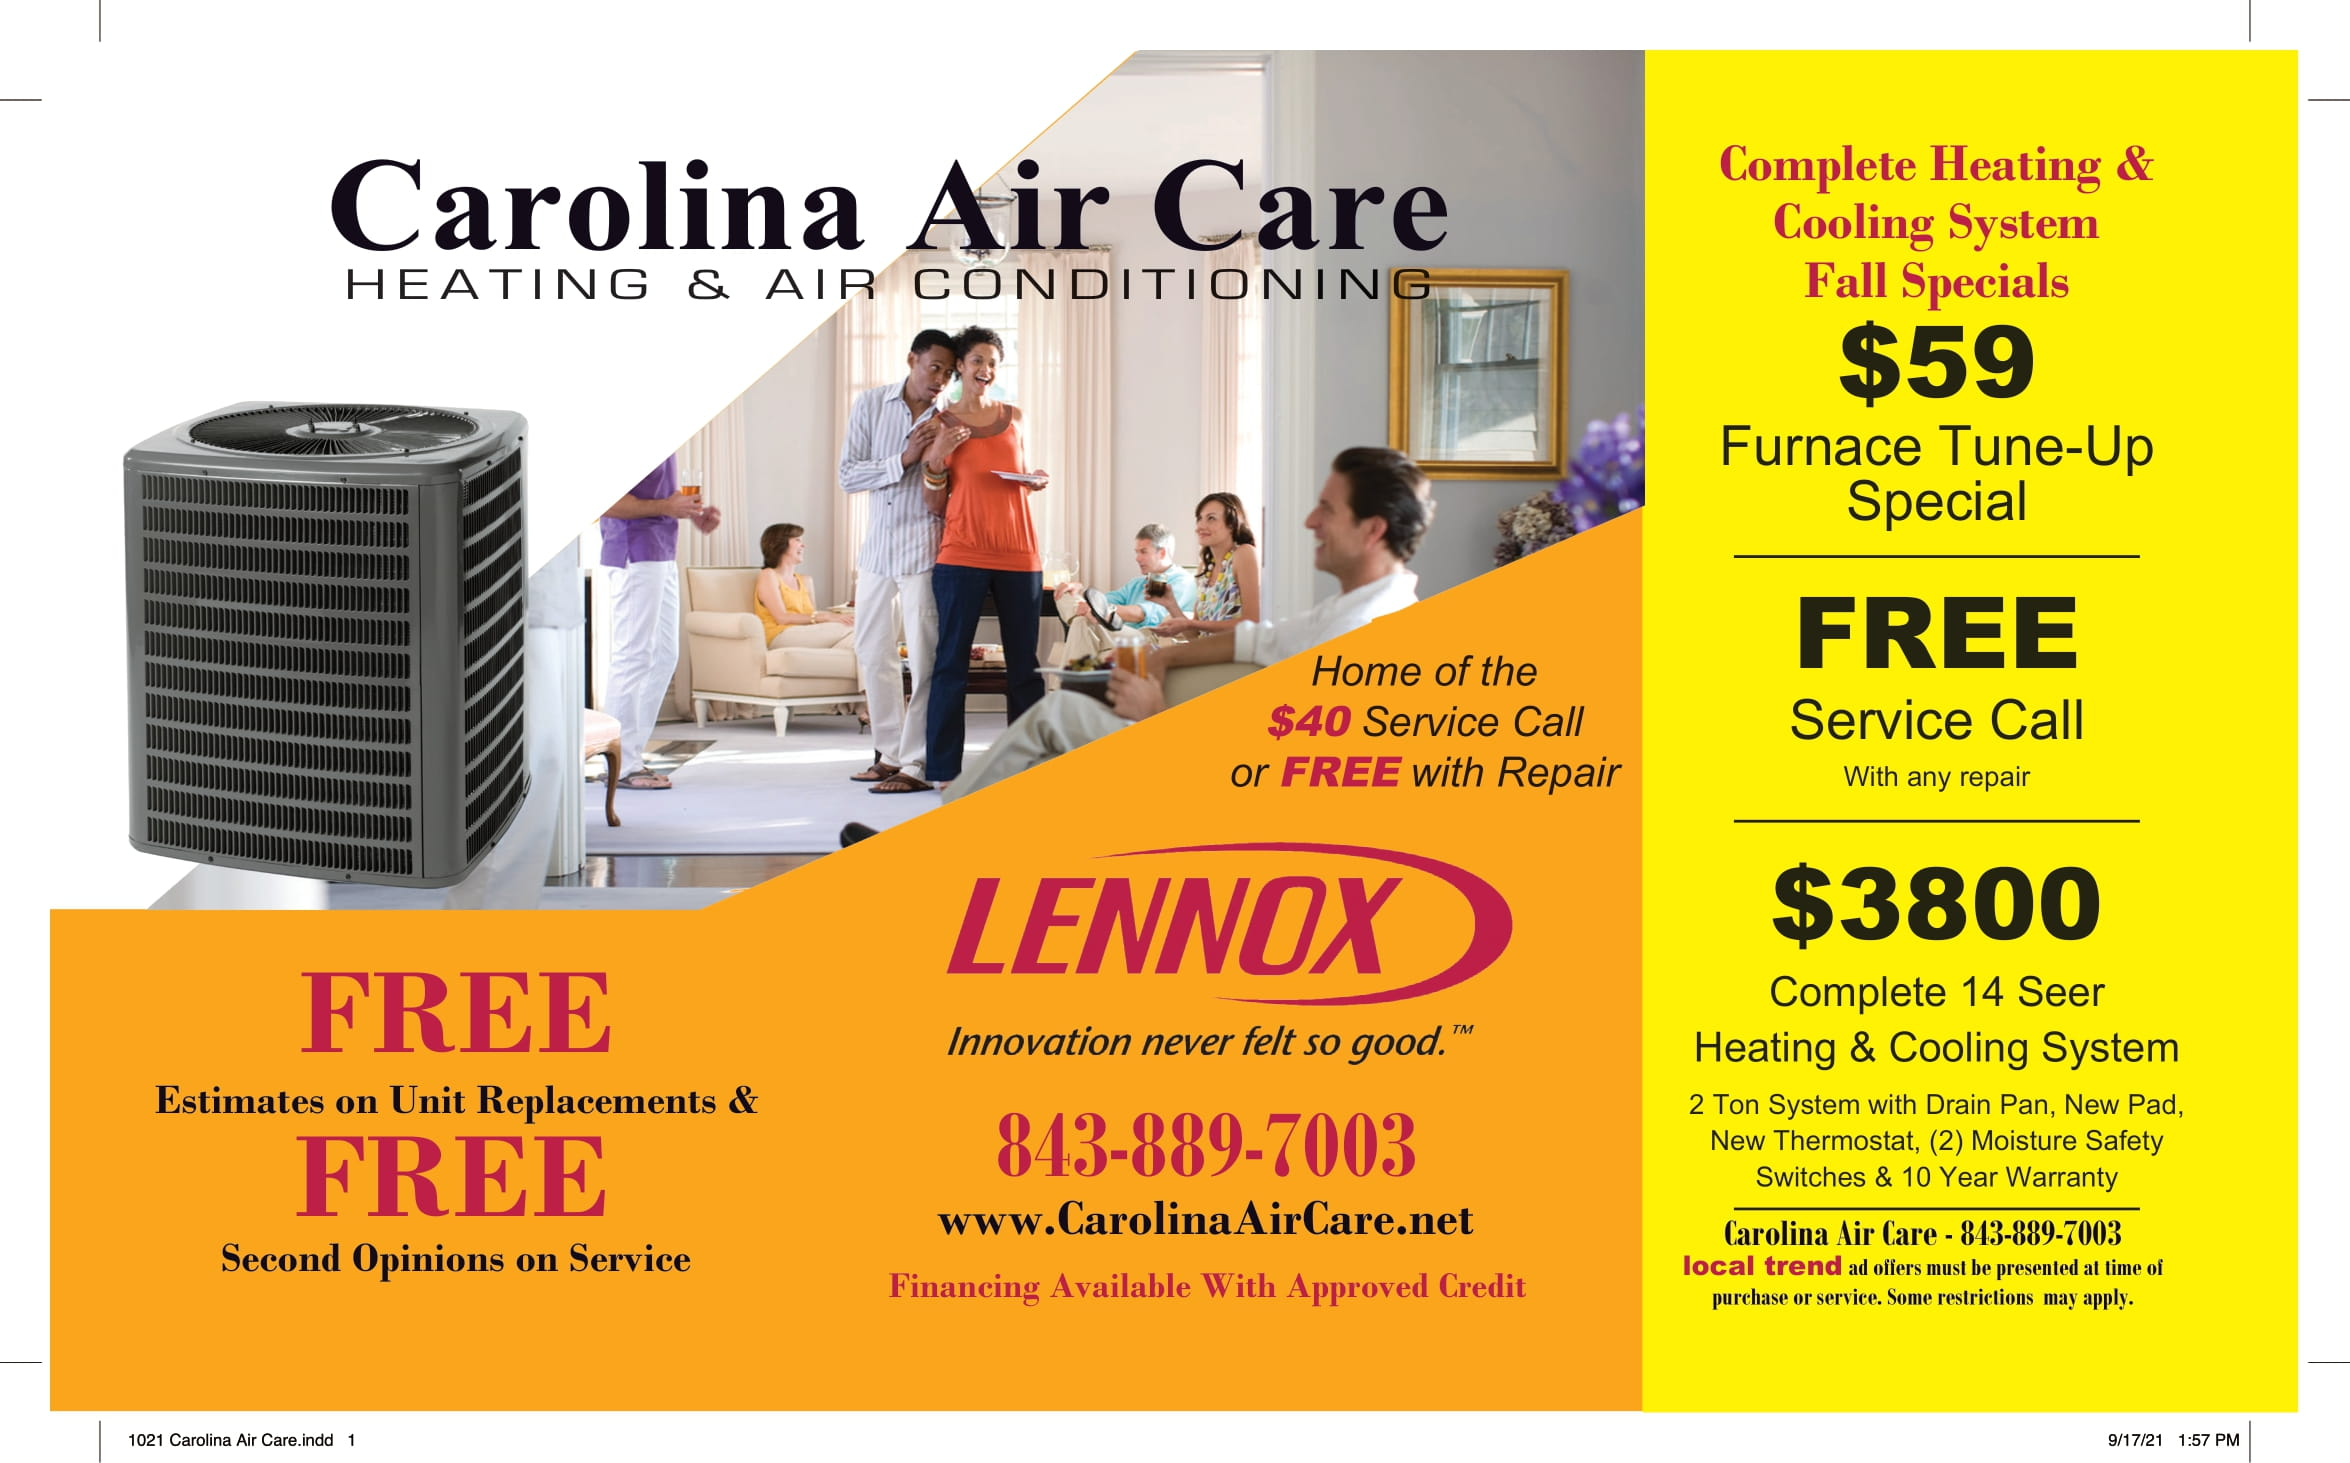 1021 Carolina Air Care 1